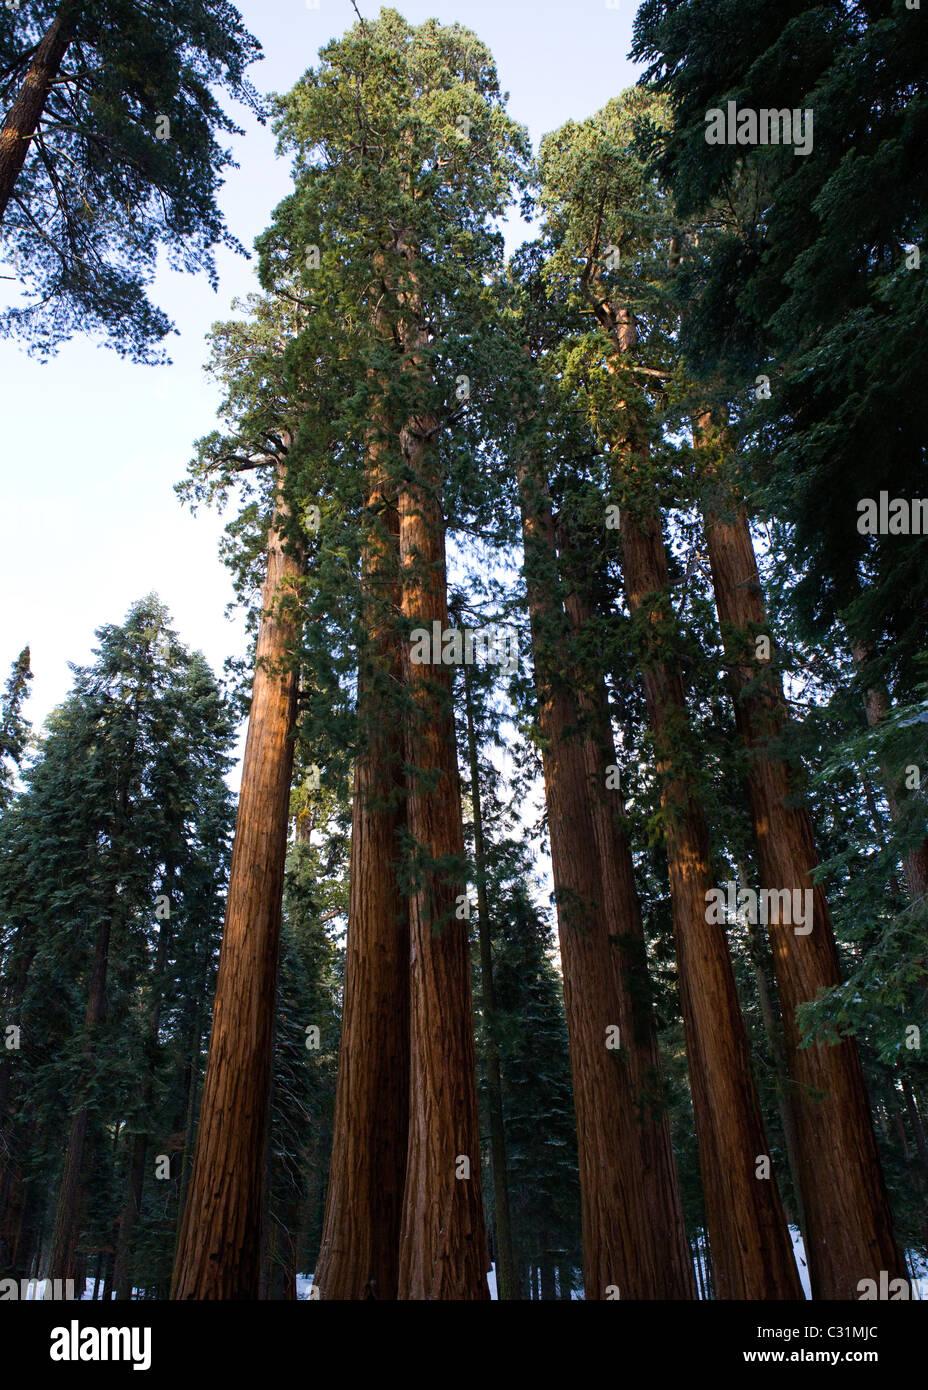 Giant Sequoia trees in winter - Stock Image